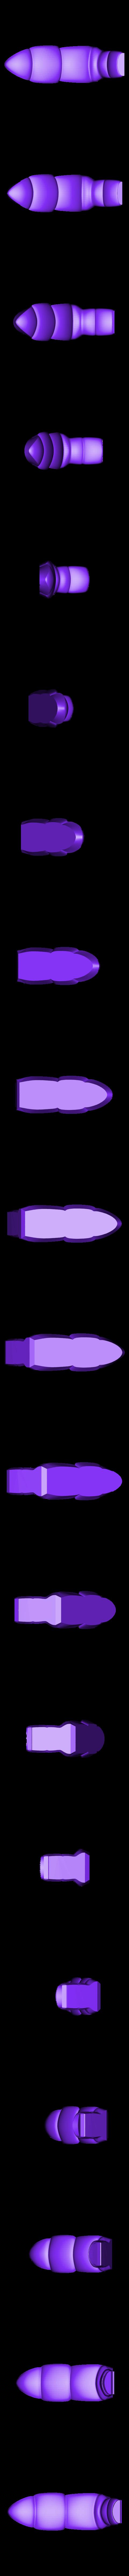 body_bottom_in.stl Download free STL file The Caterpillar • 3D print model, reddadsteve